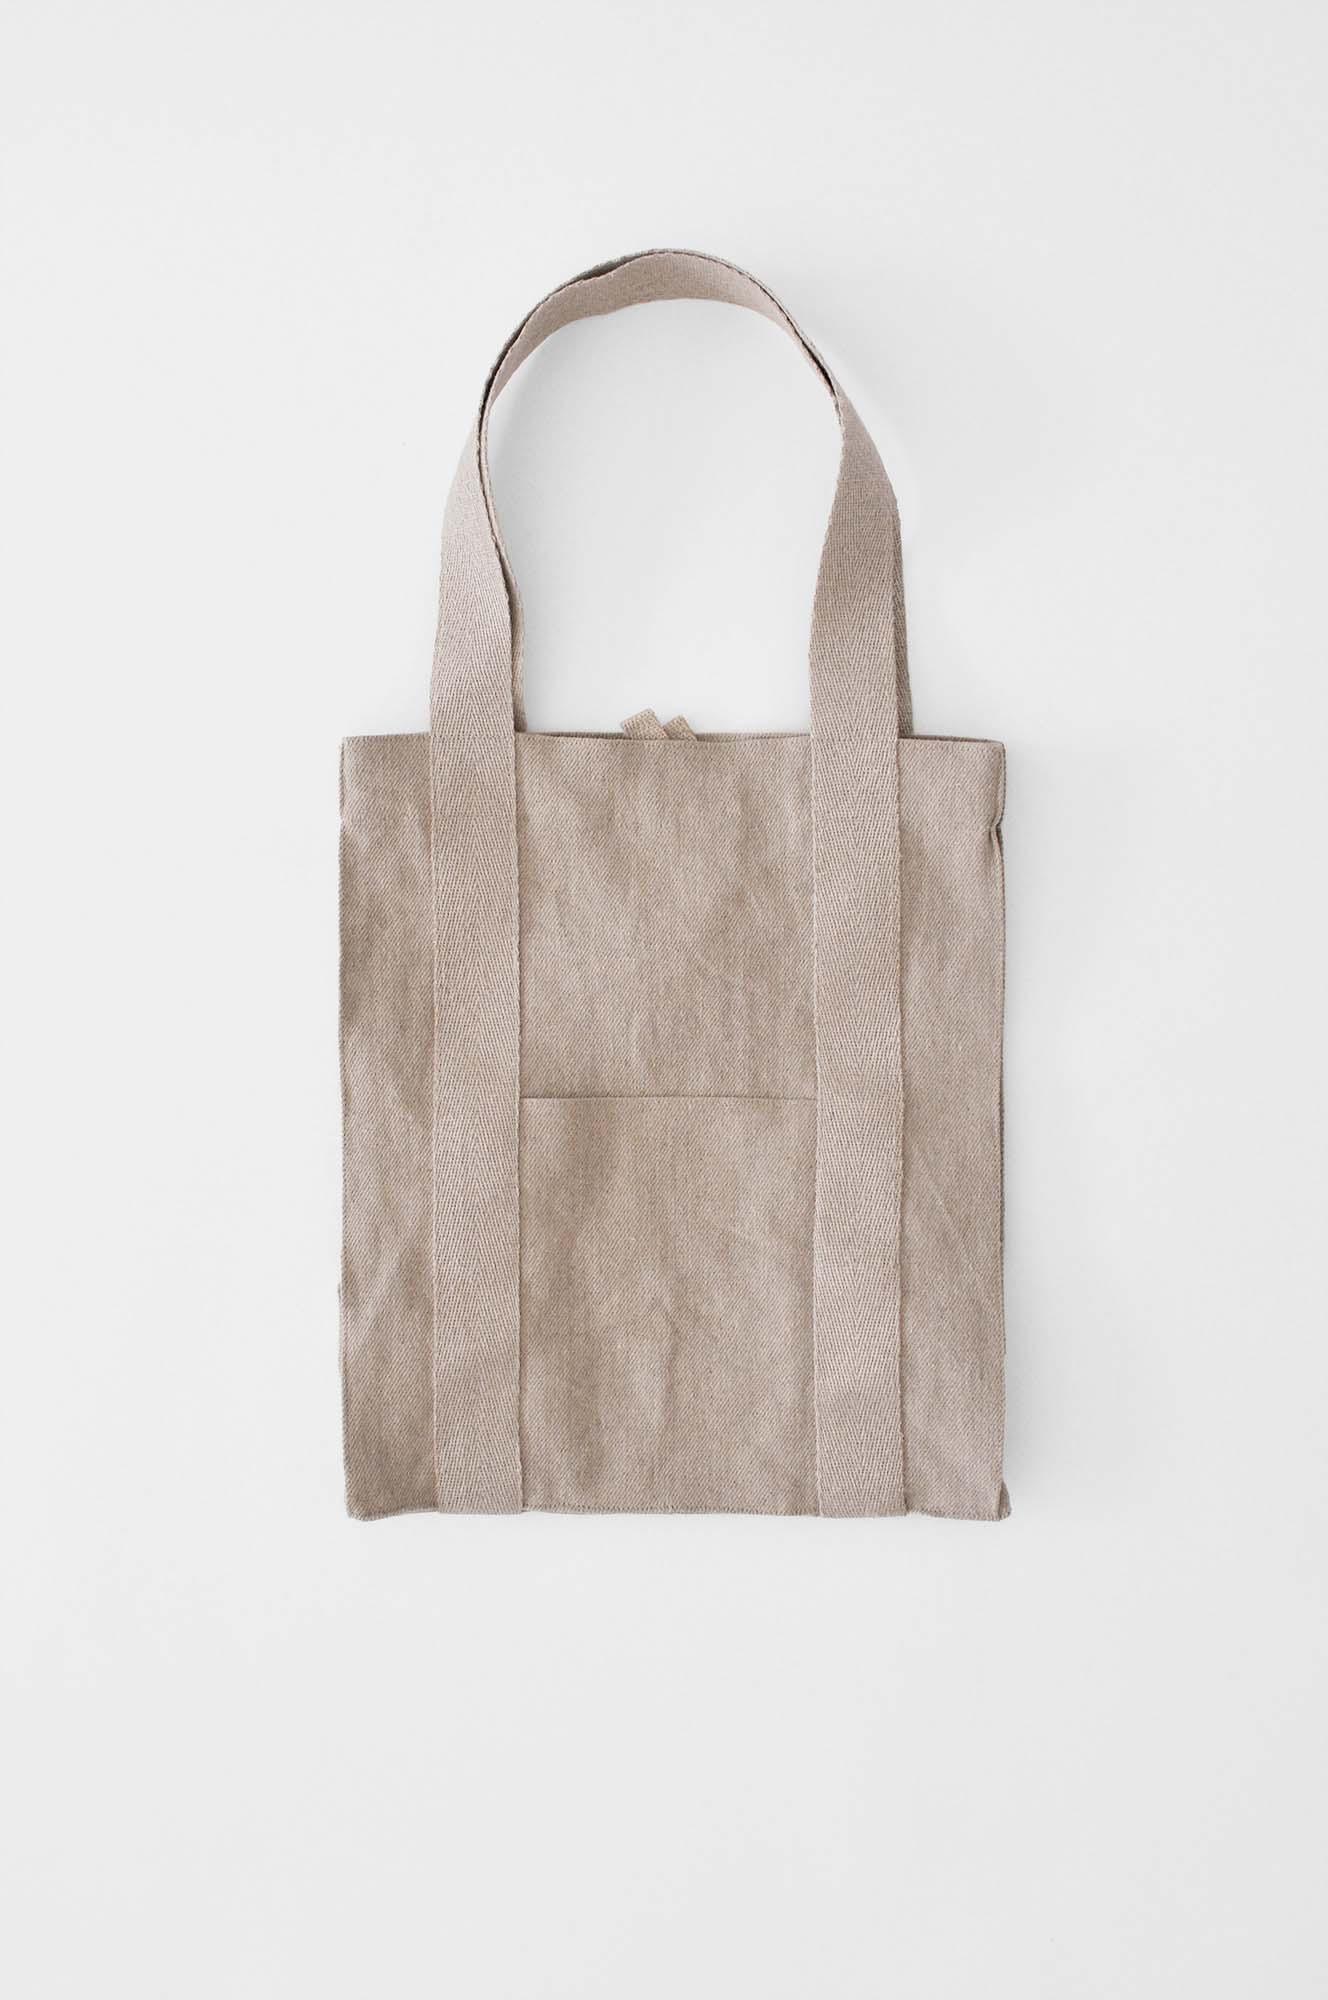 Linen yoga tote bag